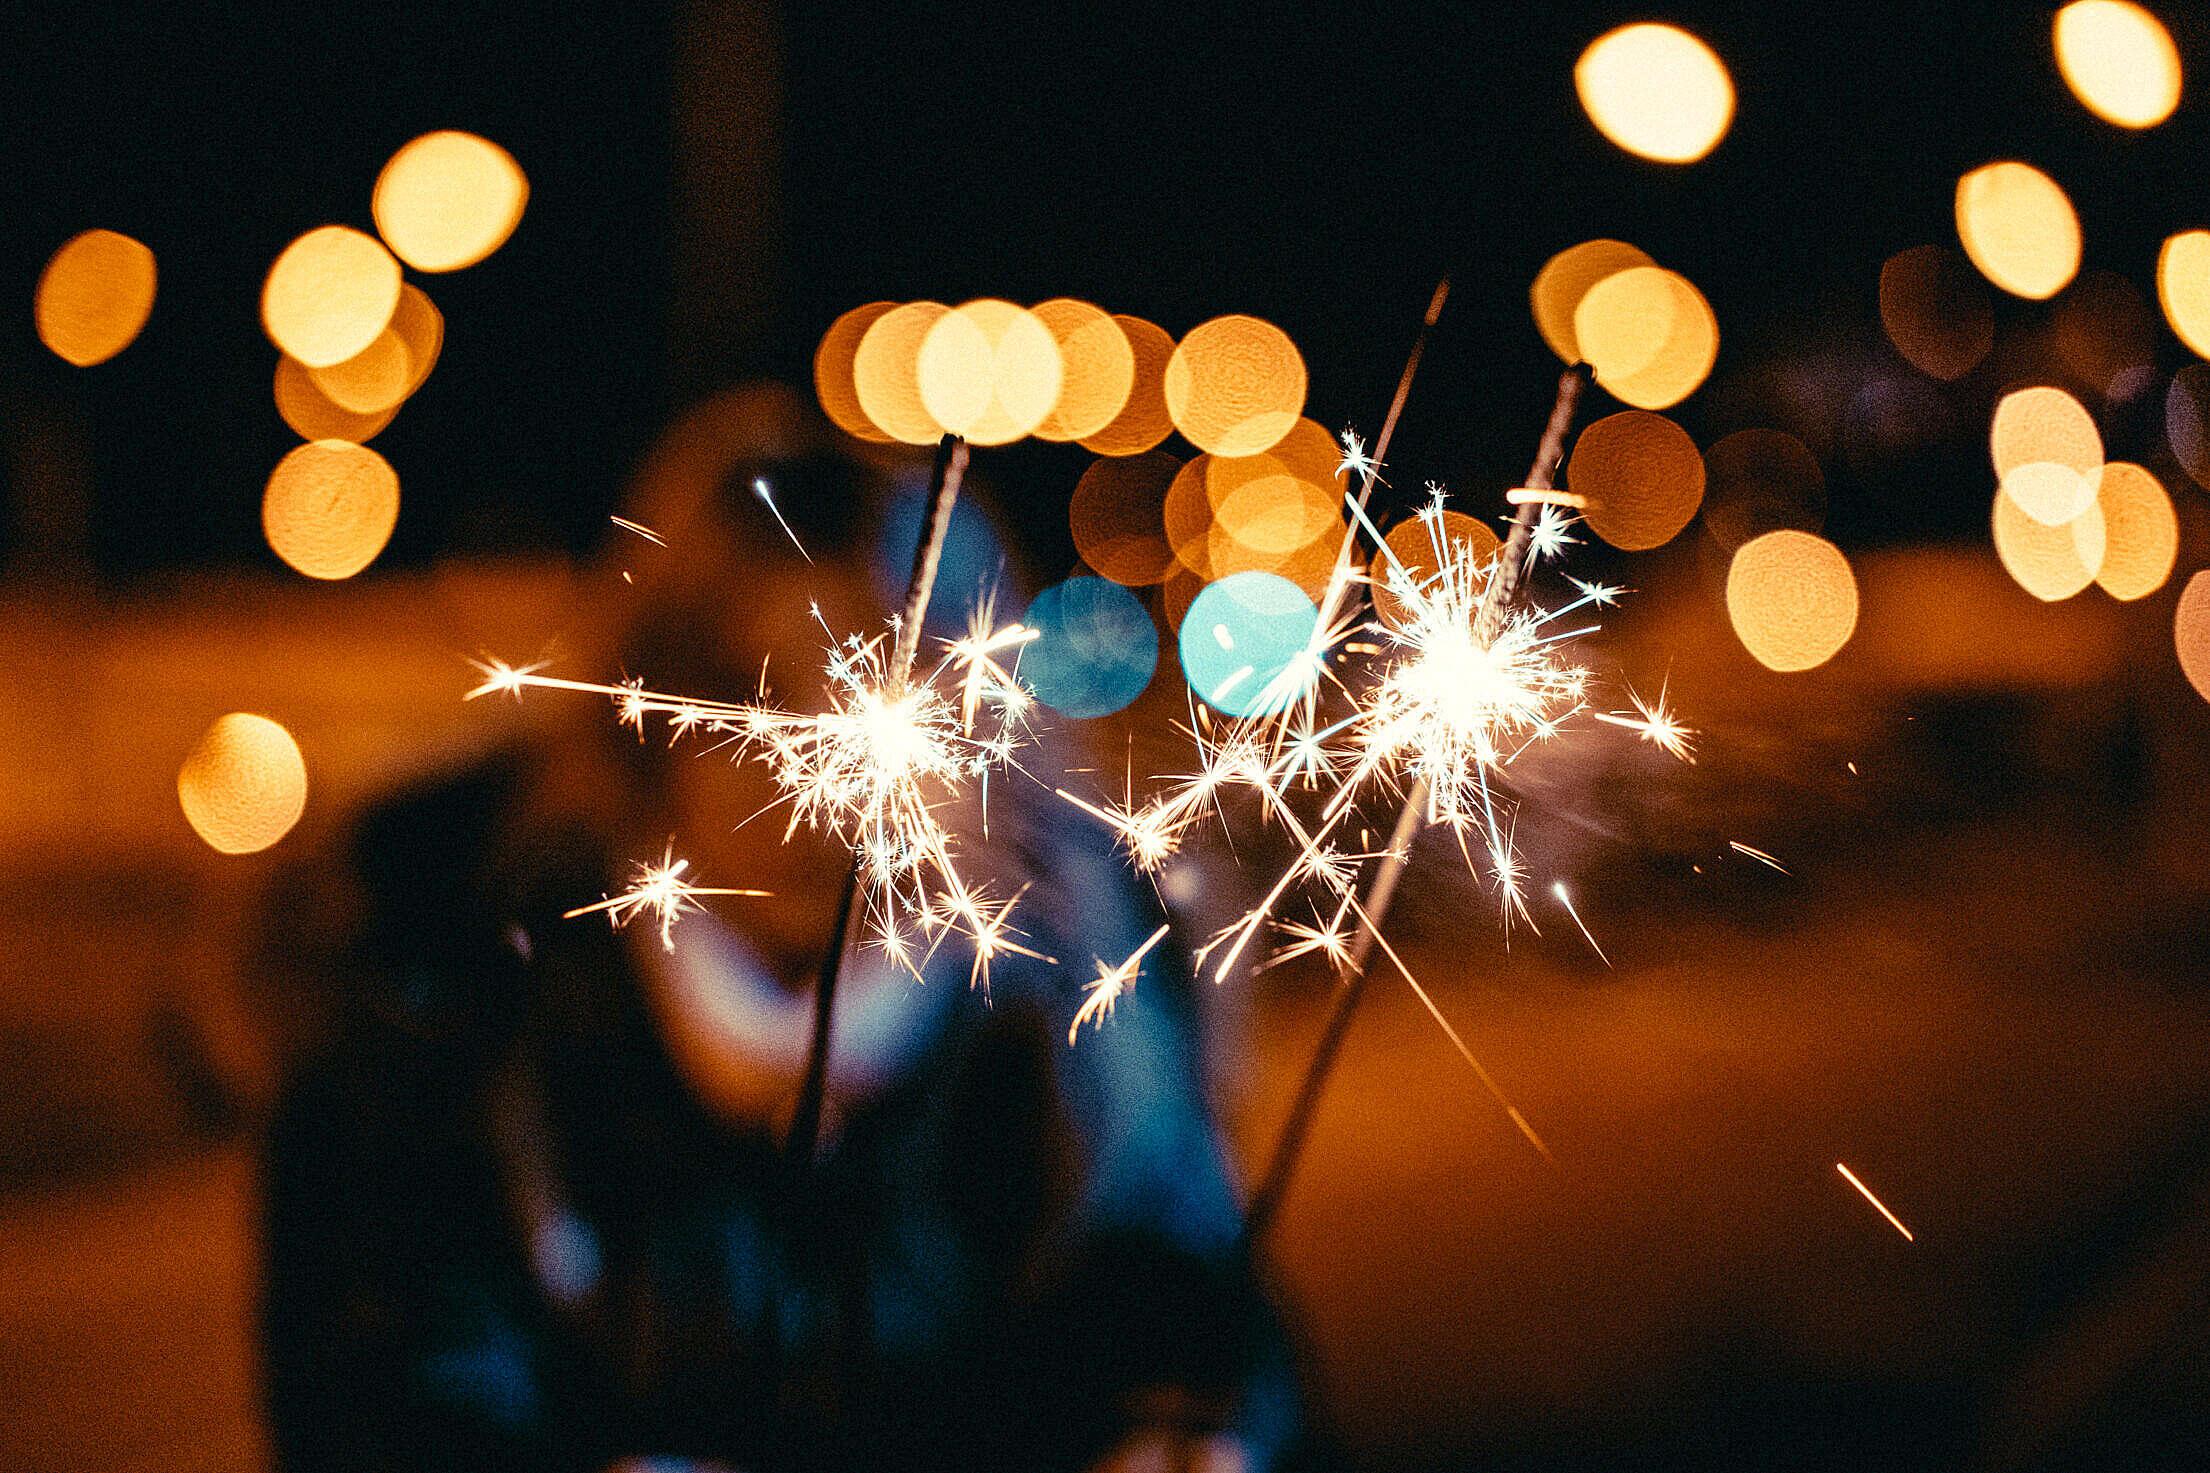 Sparklers Free Stock Photo